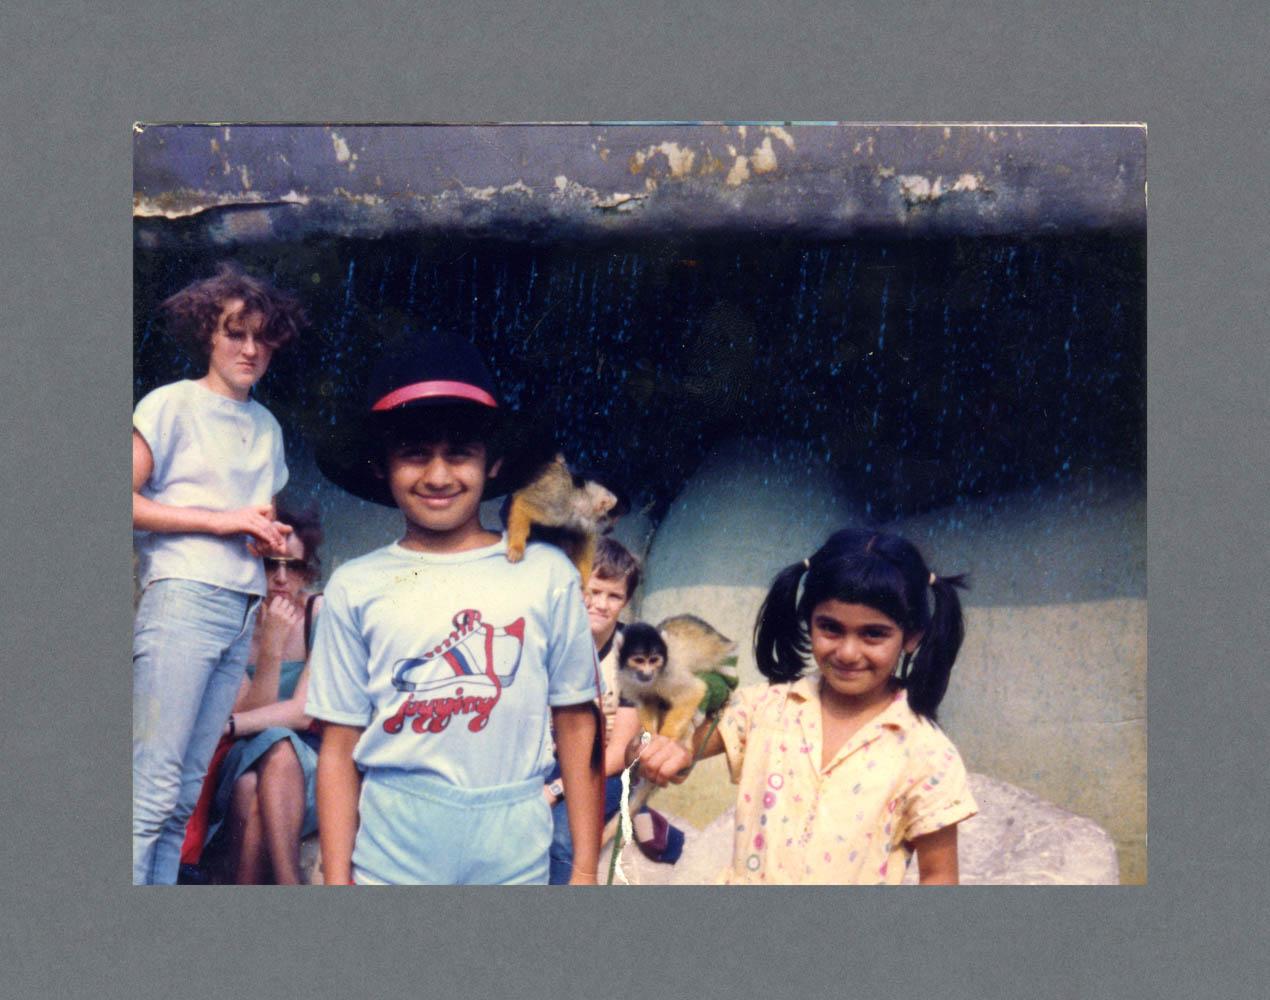 Safari Park, Bewdley c.1984